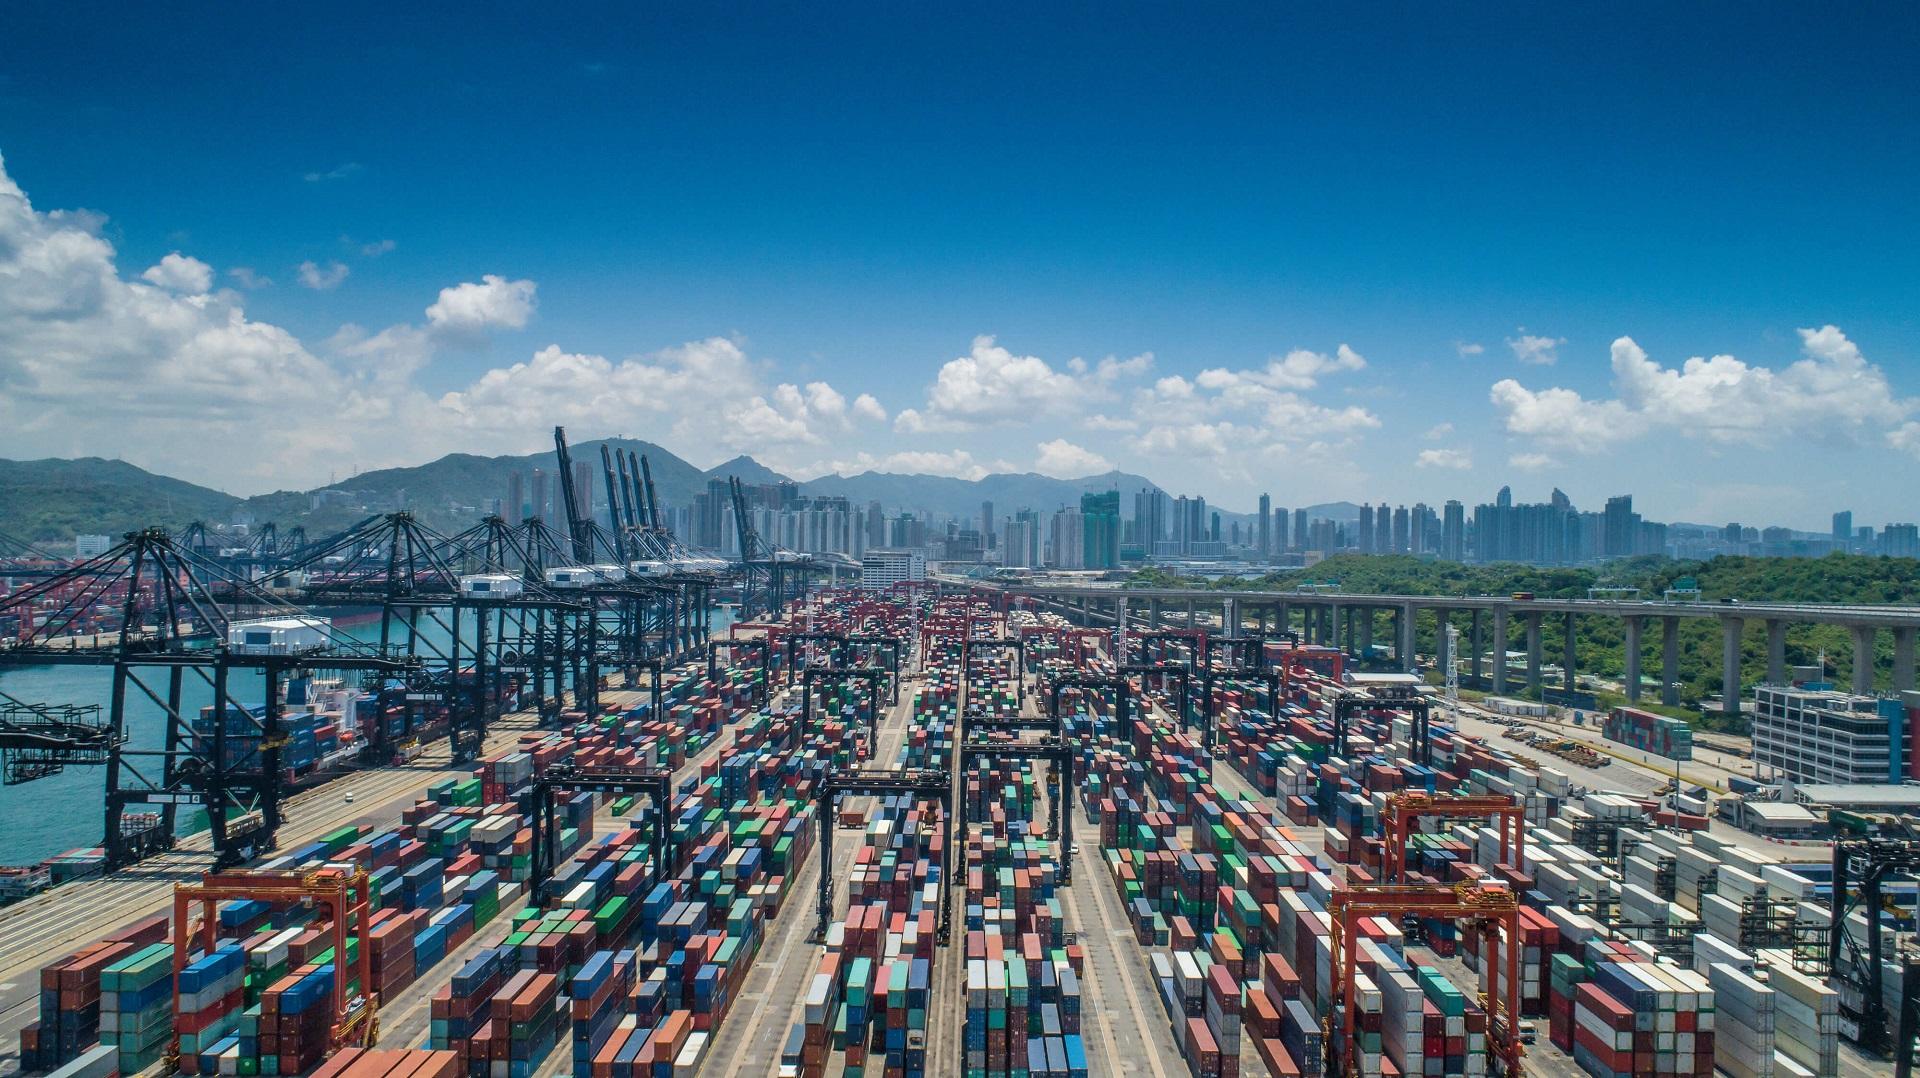 Frachthafen mit Containern in China